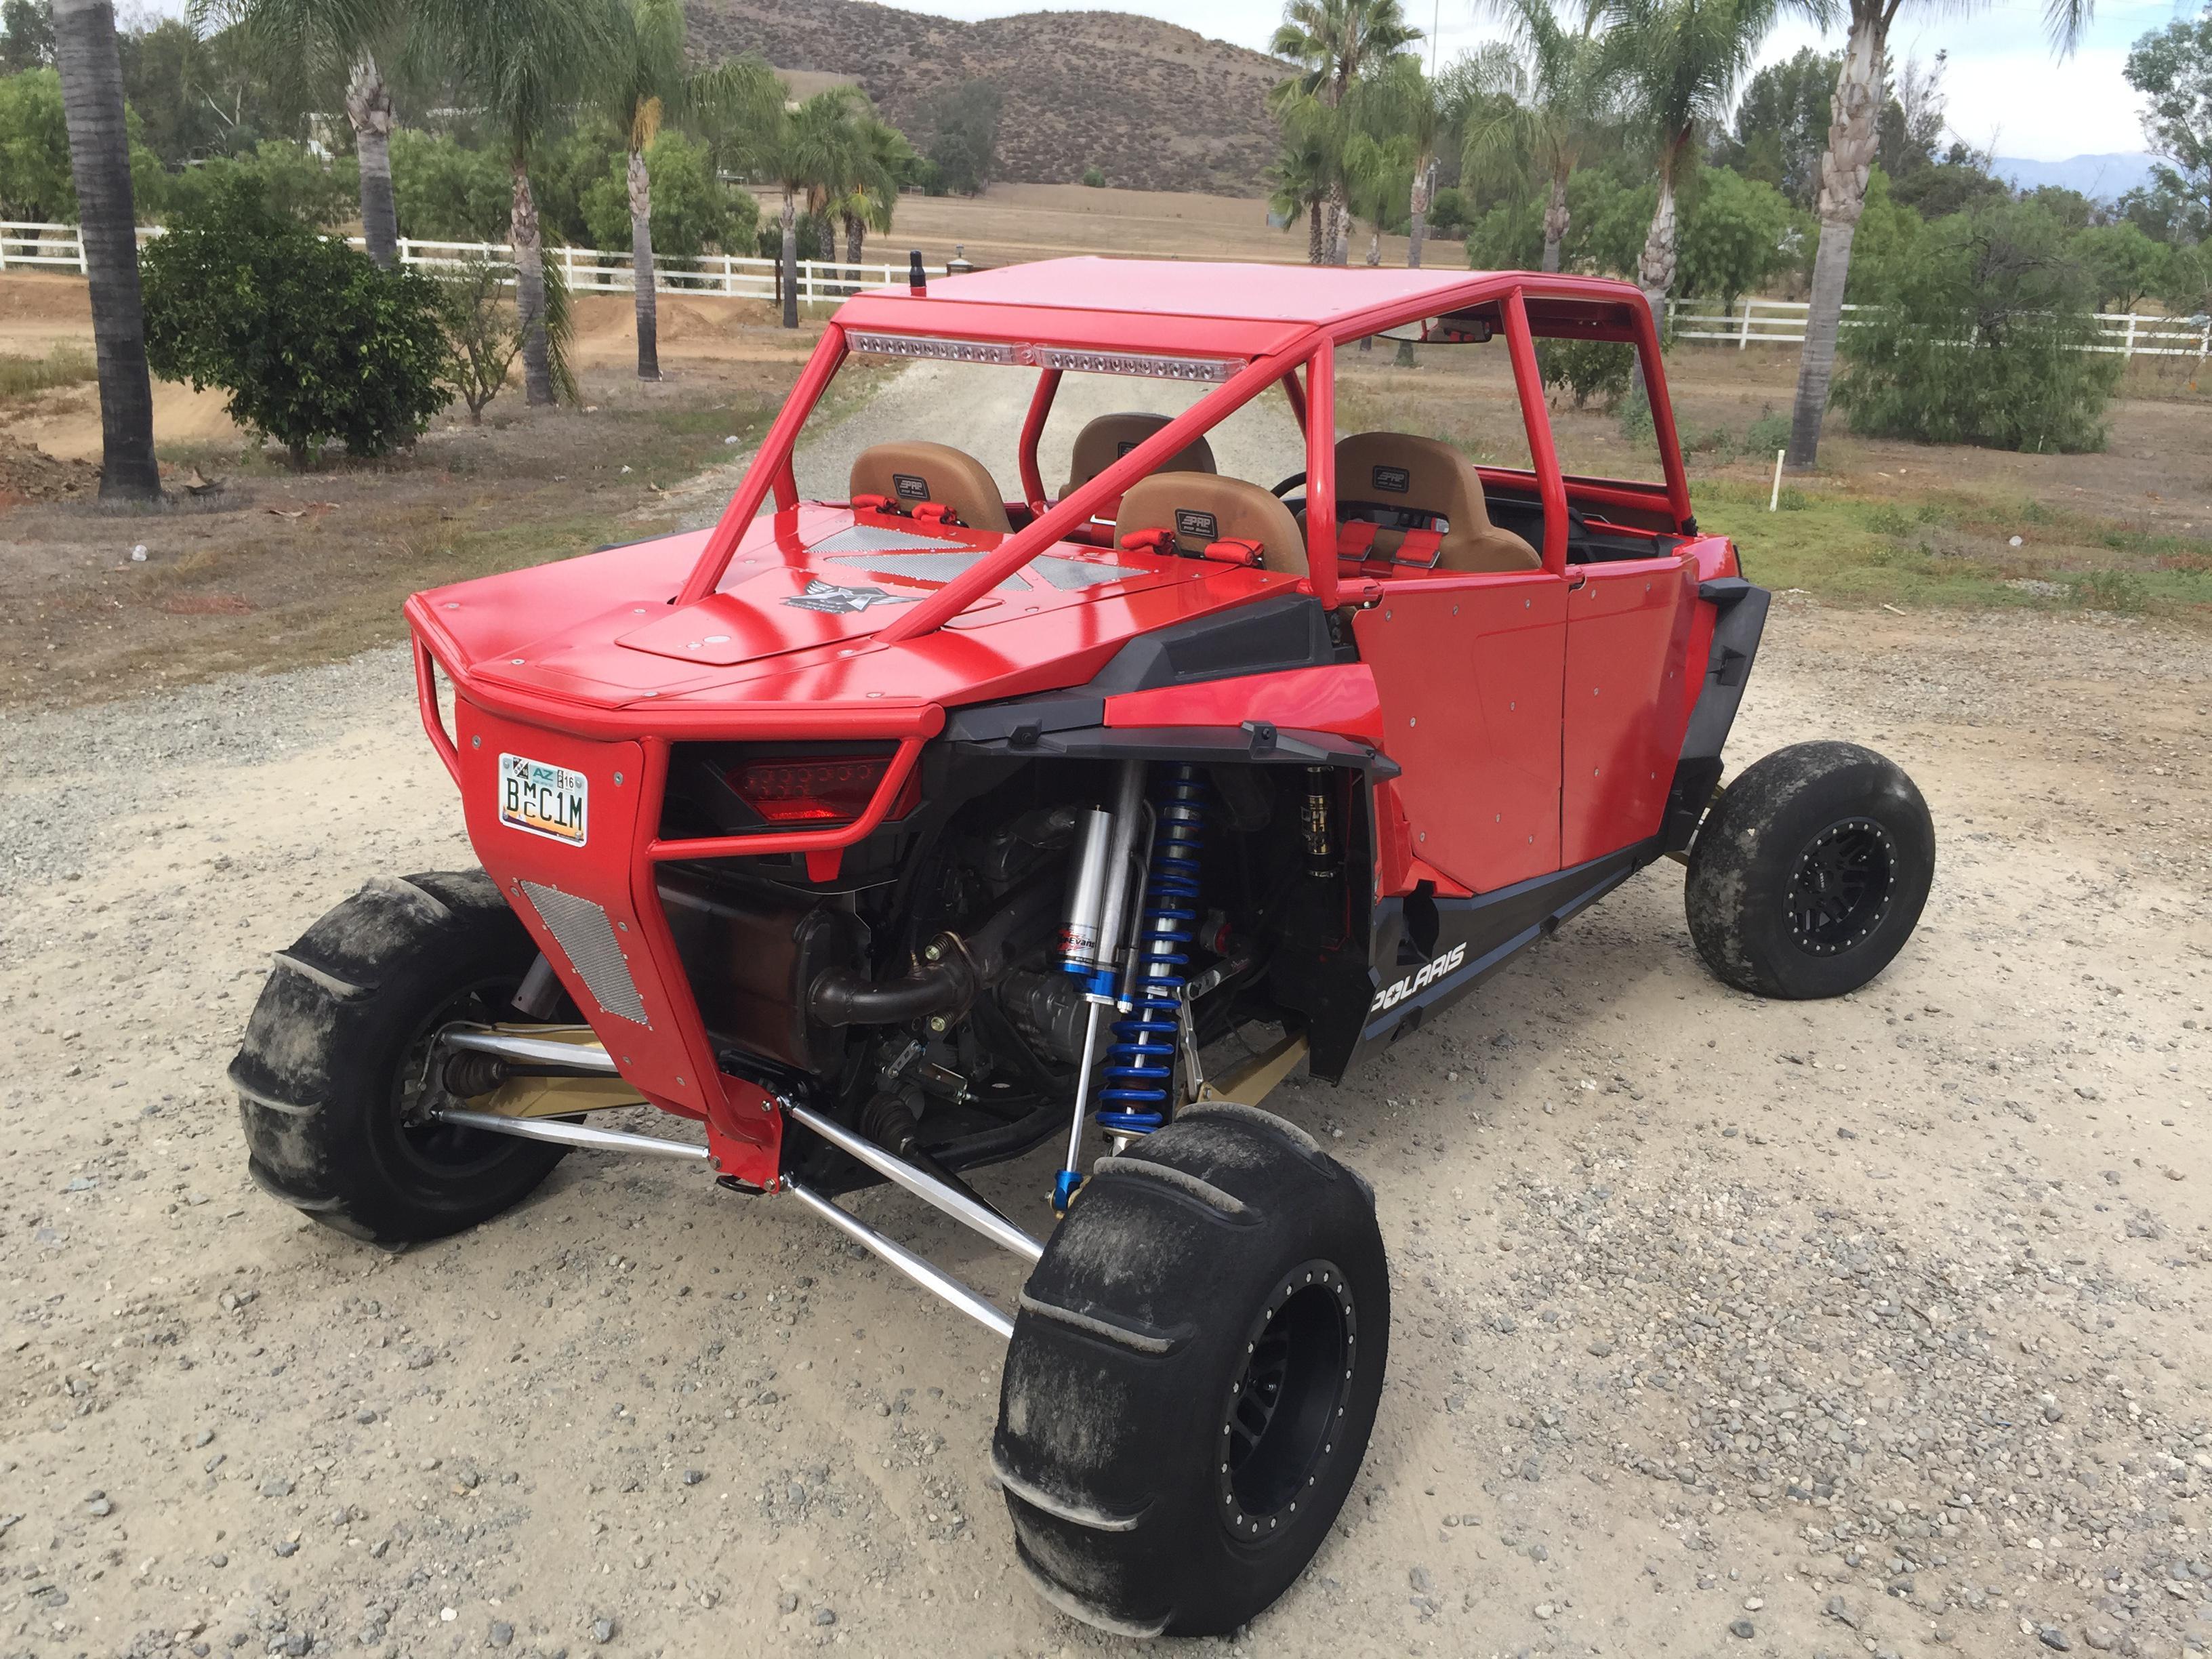 Madigan Motorsports Rzr Xp1000 Xpturbo 4 Seat Roll Cage